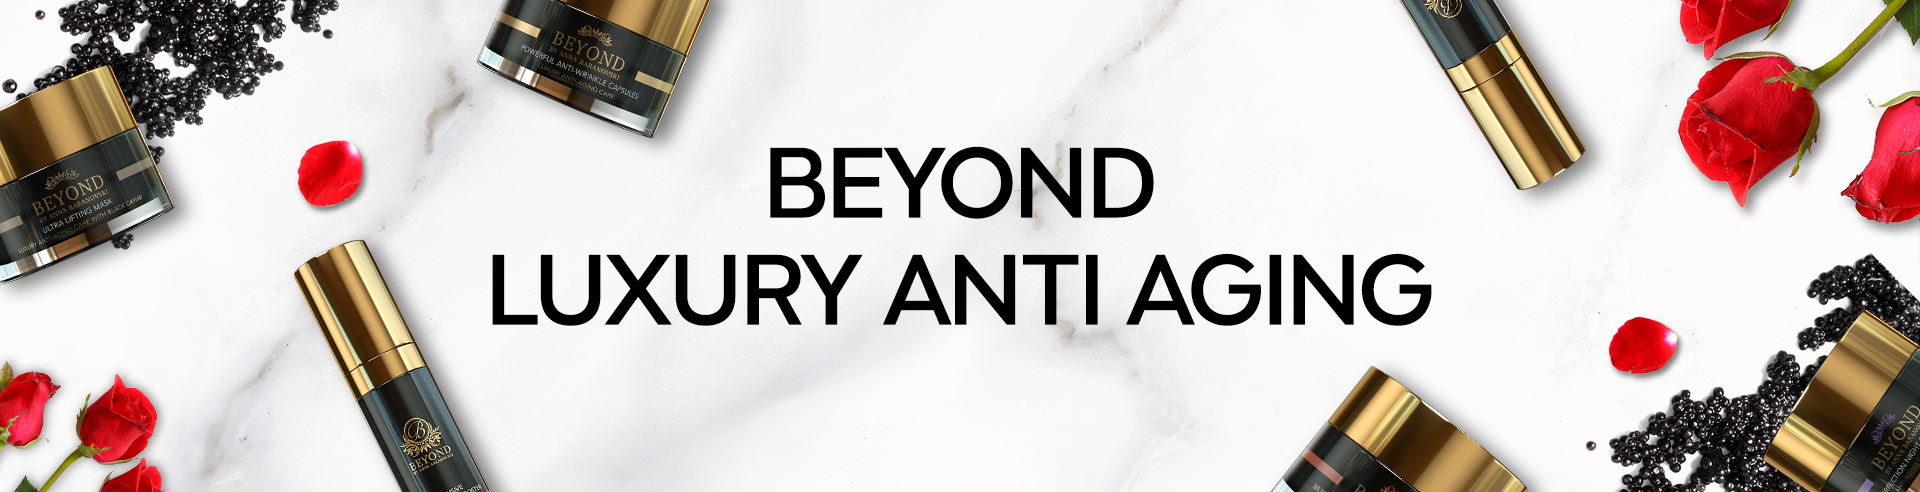 Beyond Luxury Anti Aging